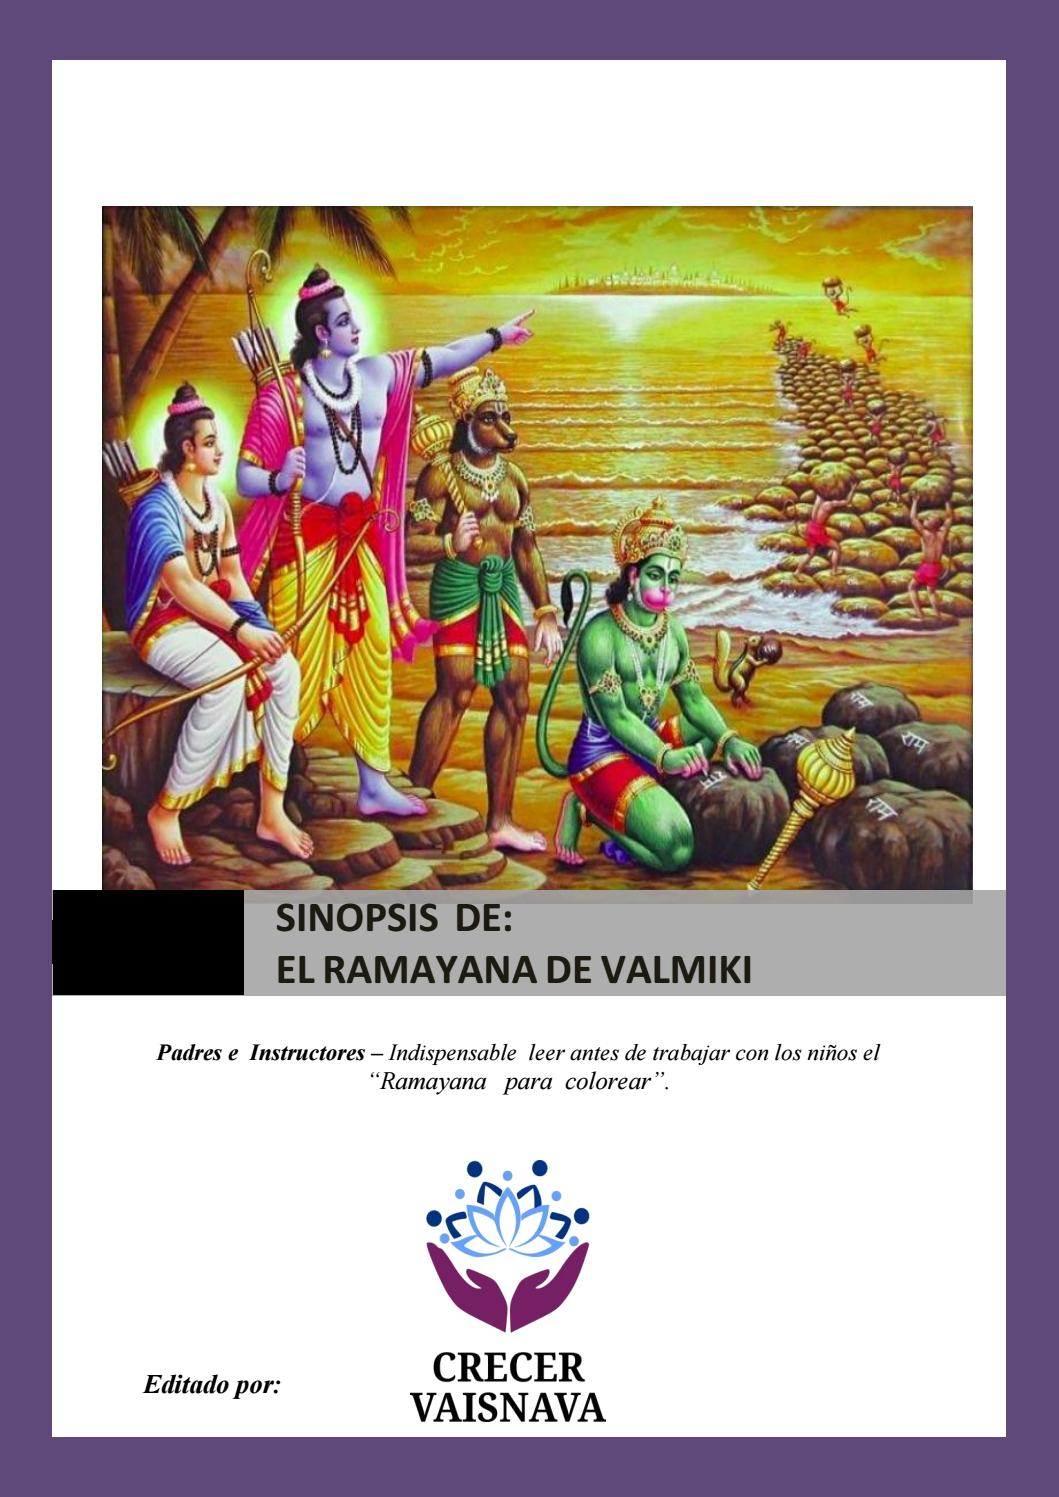 Sinopsis ramayana de valmiki by Crecer Vaisnava - issuu